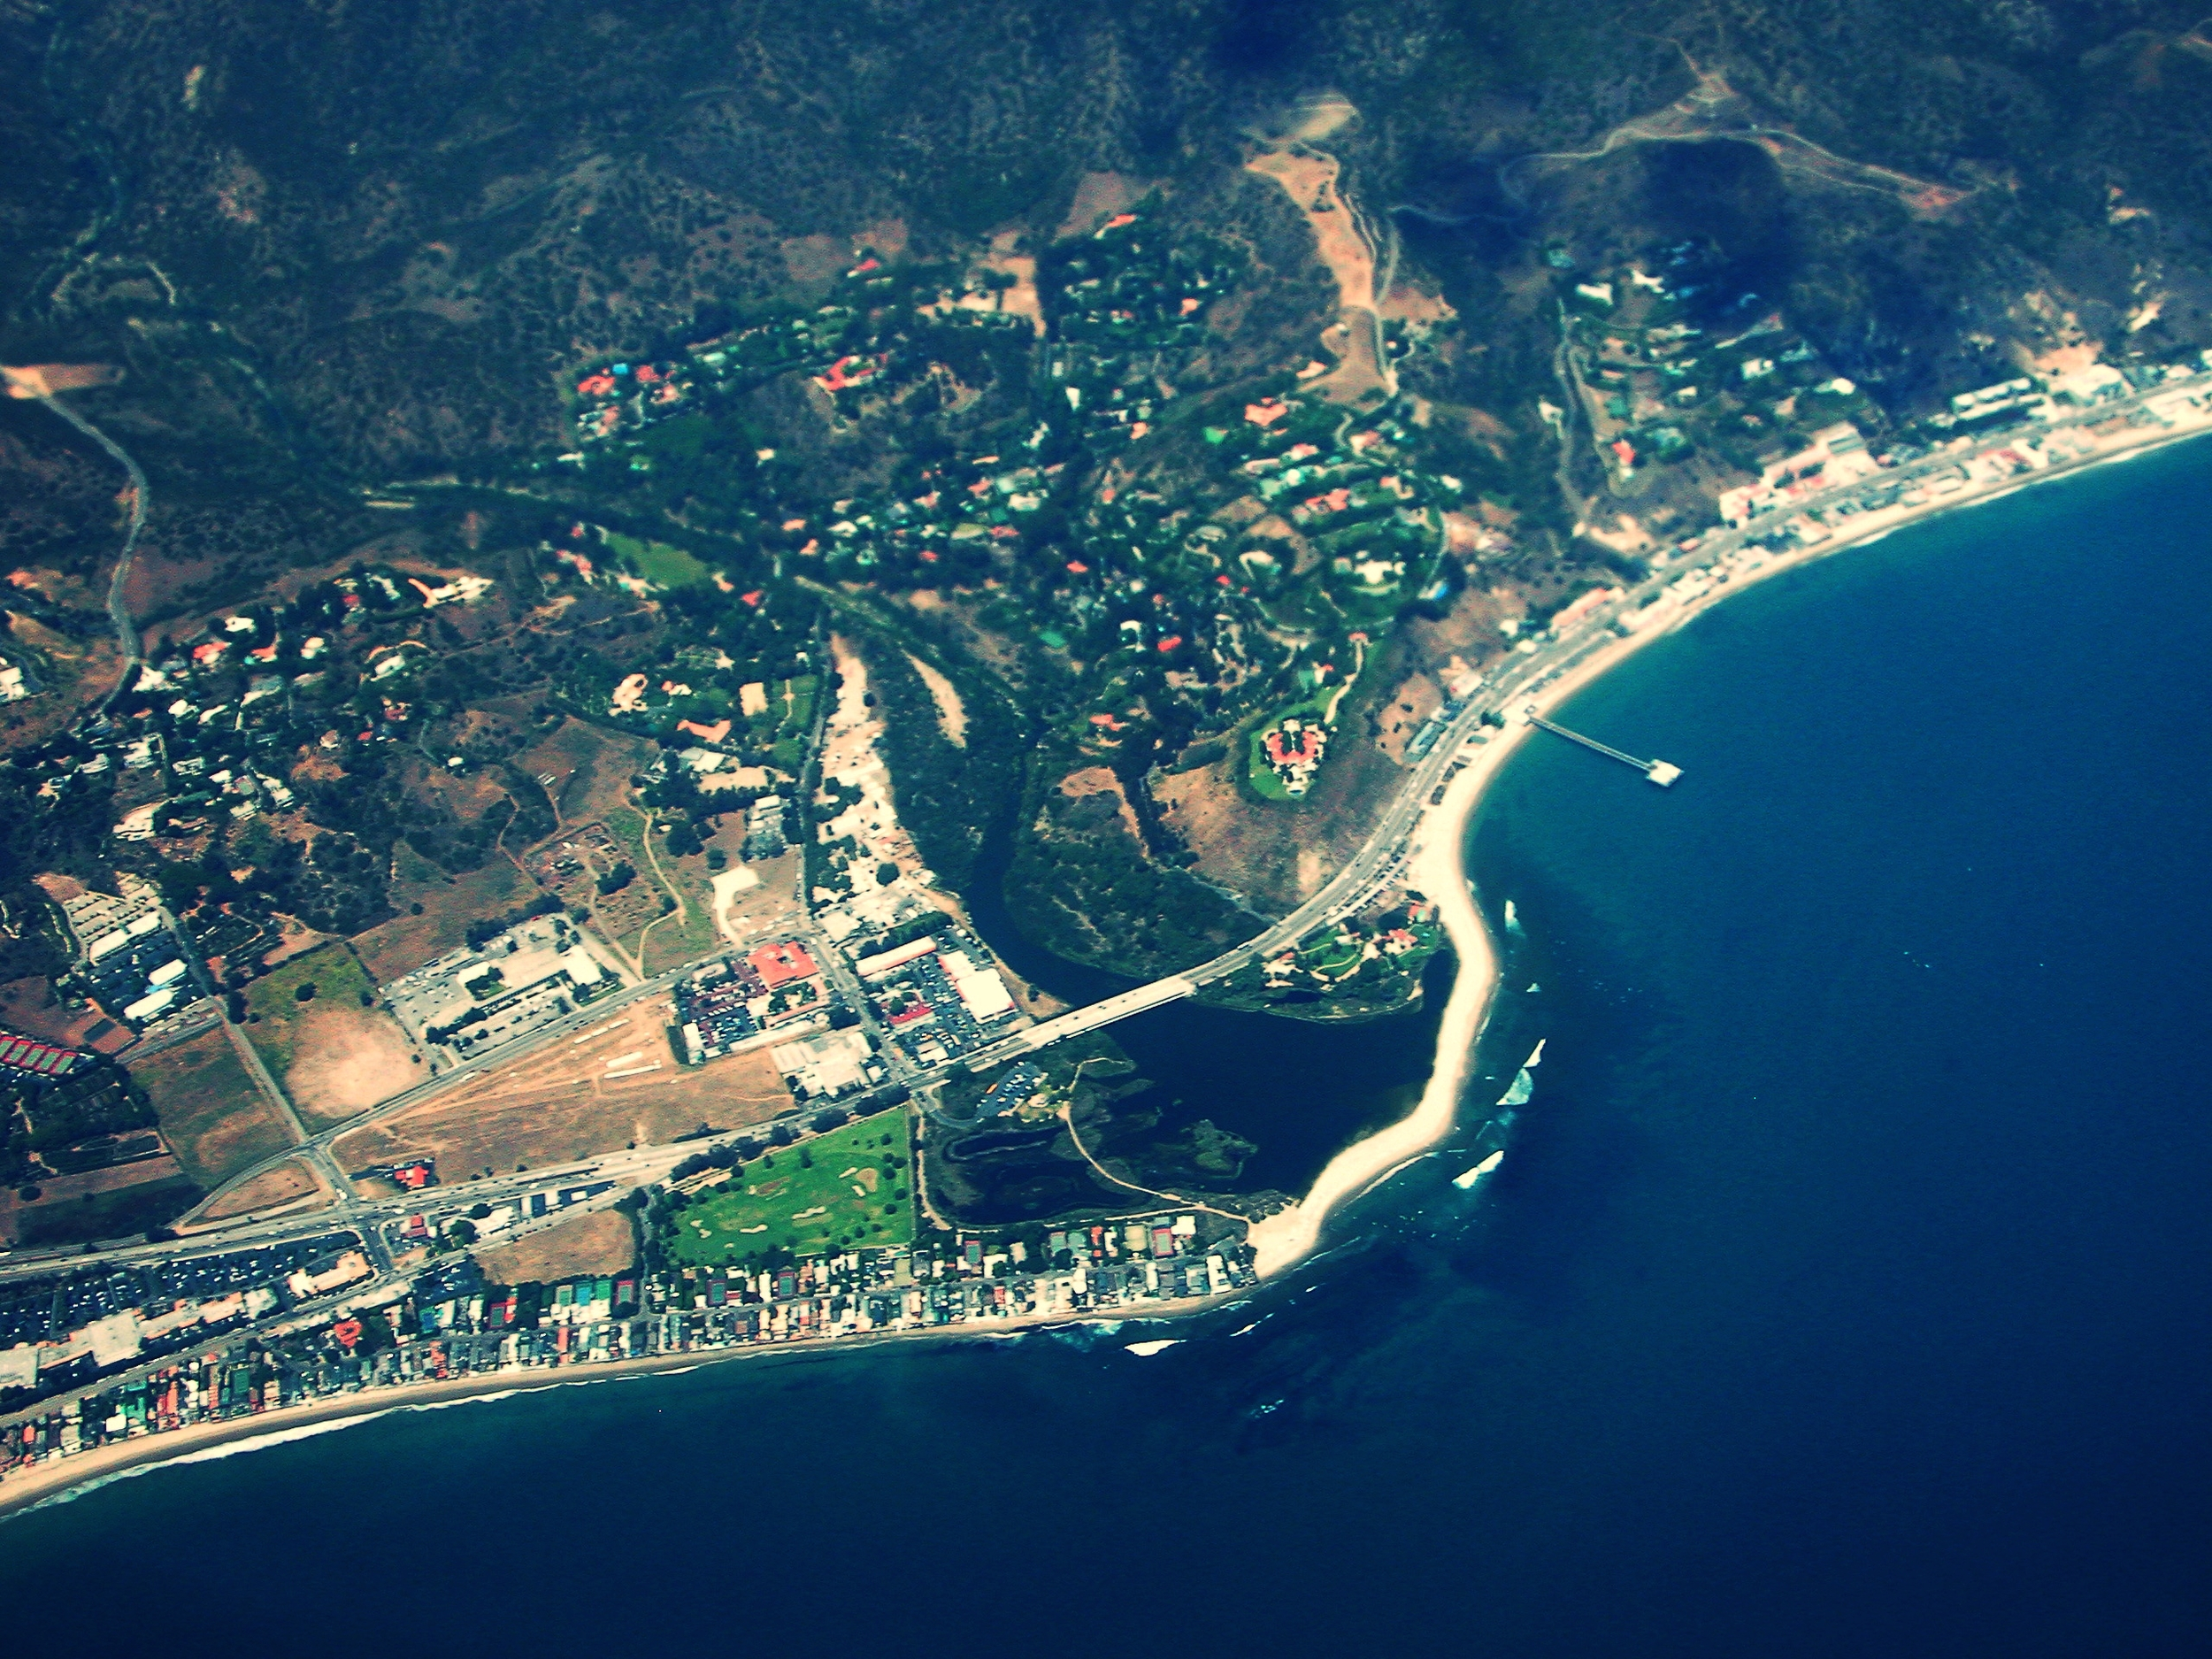 Malibu, California - Home of Pepperdine University (Photo: Wikipedia)